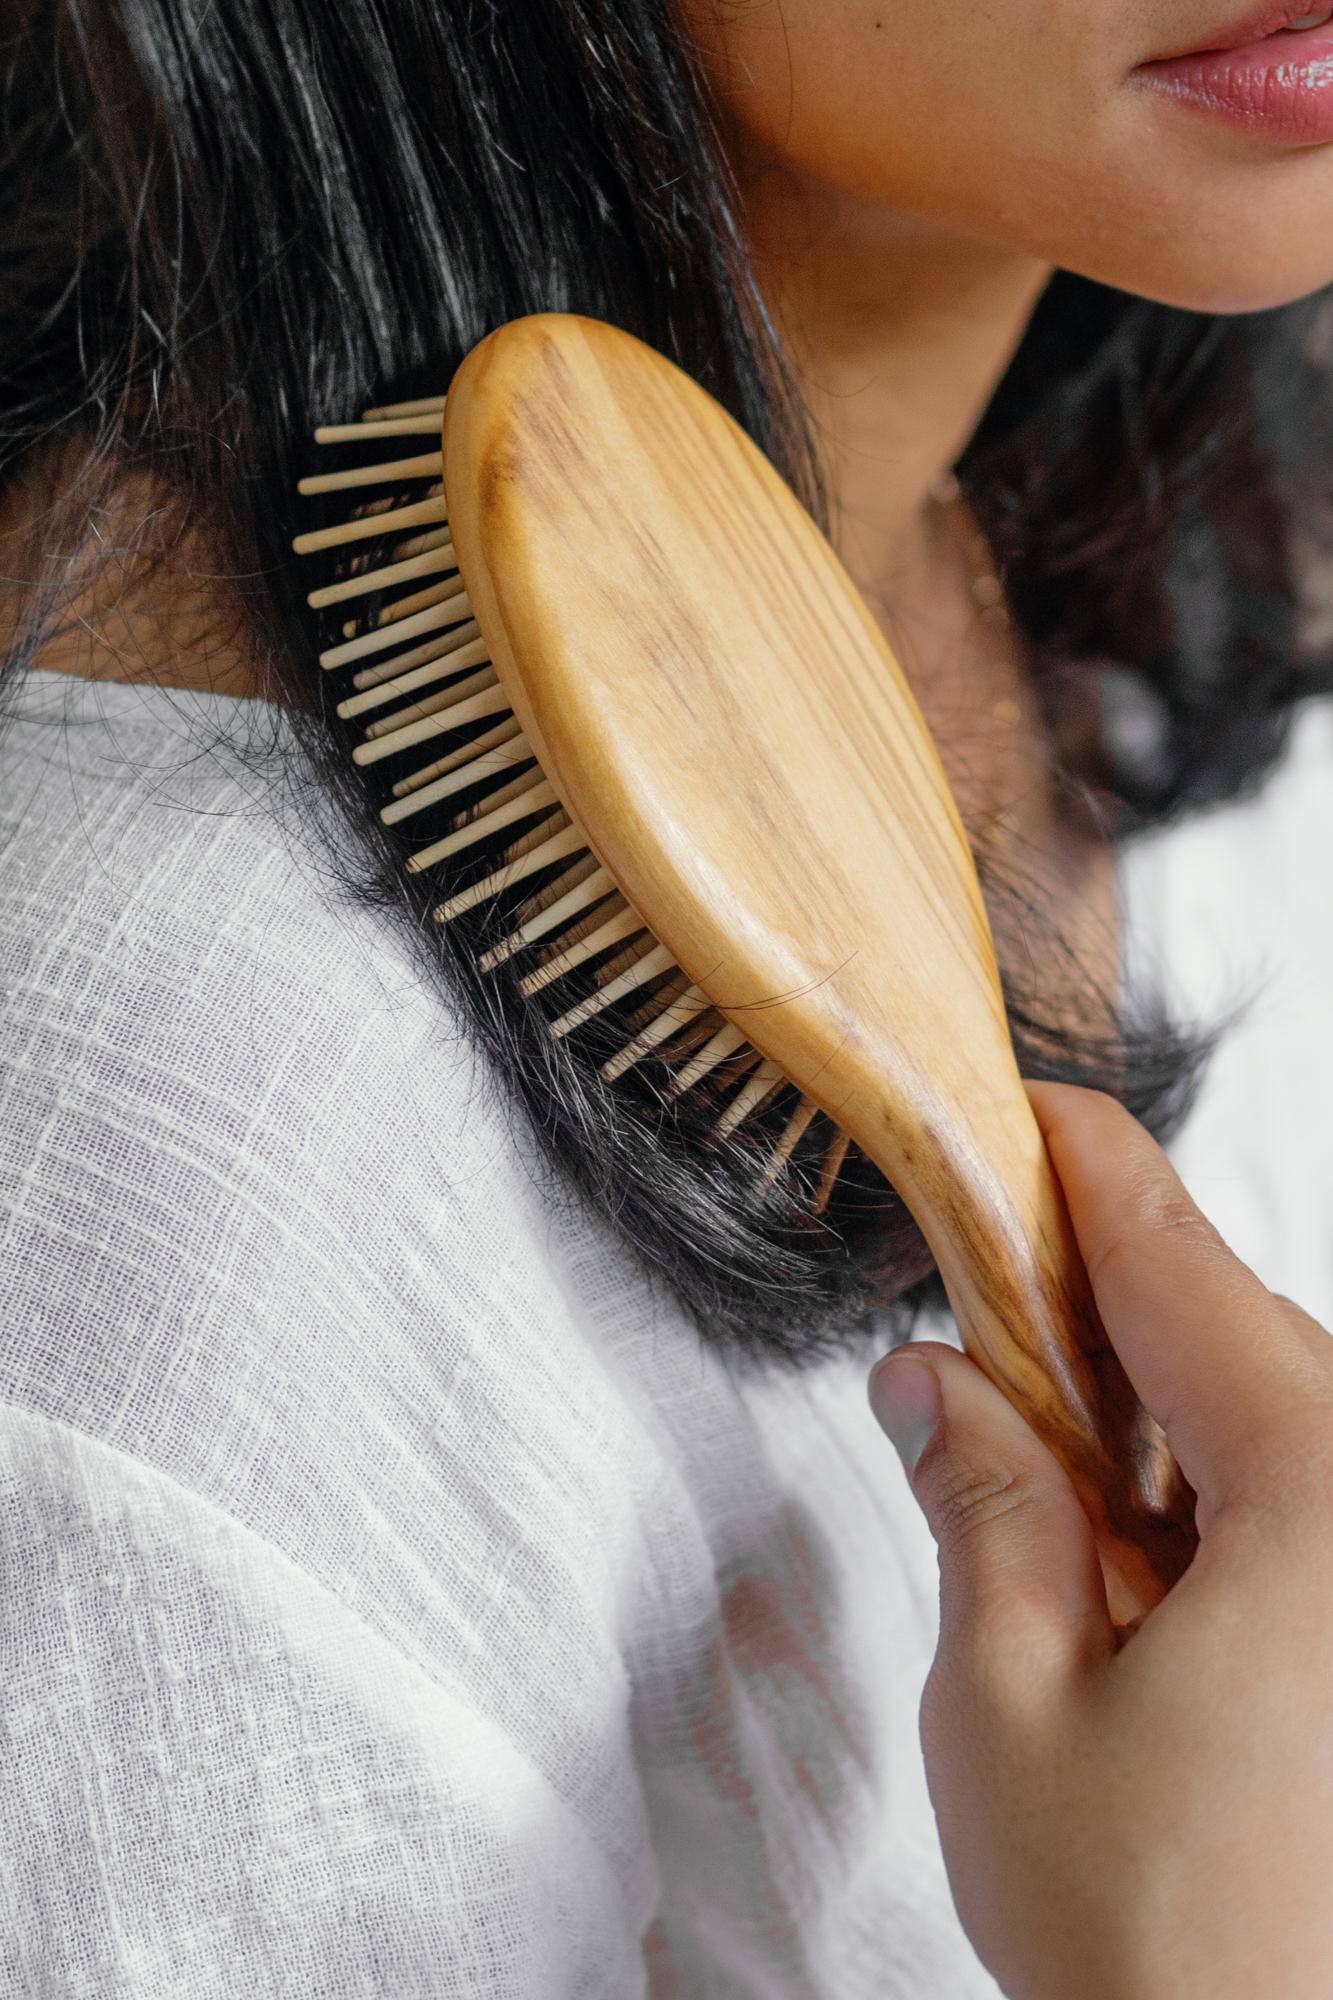 The Olive Brush Natural Wooden Hairbrush Anti-static SAYA Designs